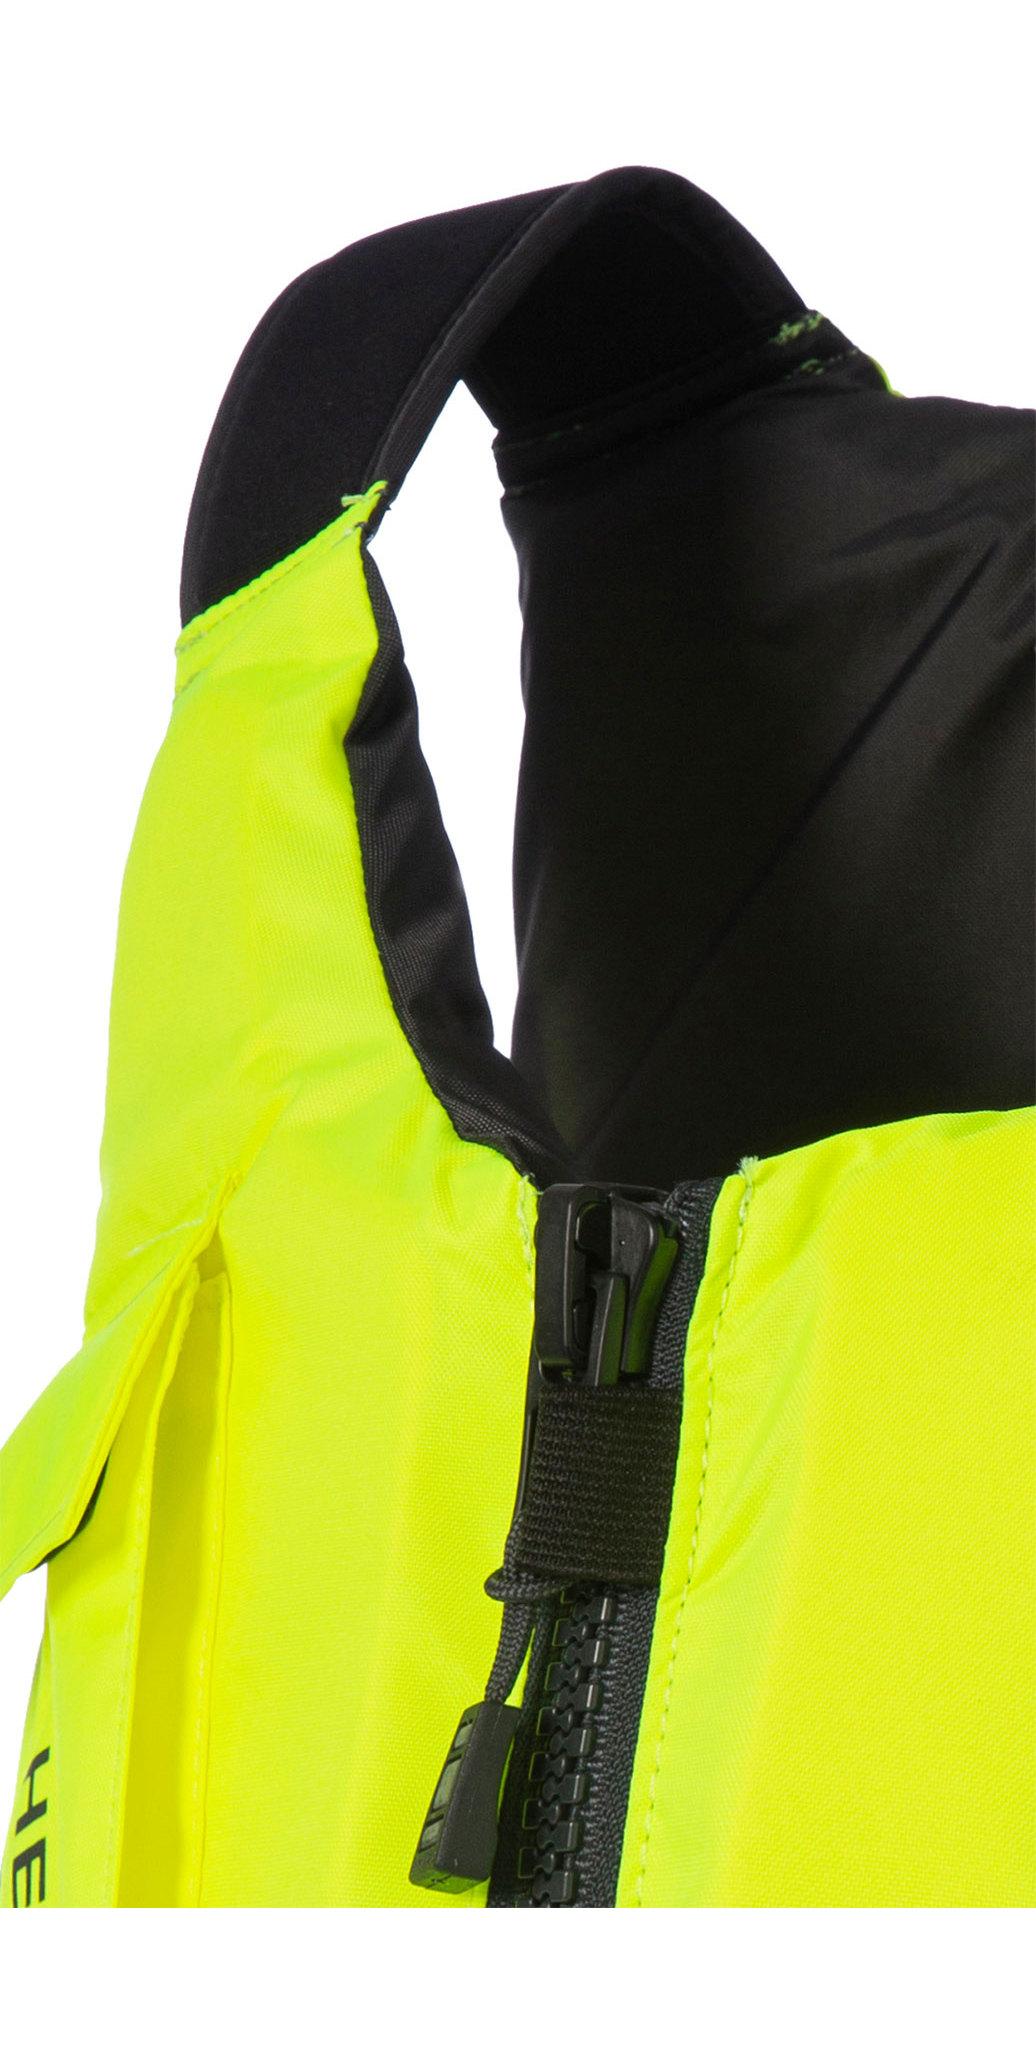 2020 Helly Hansen 50n Rider Colete / Flutuabilidade 33820 - Fluro Amarelo